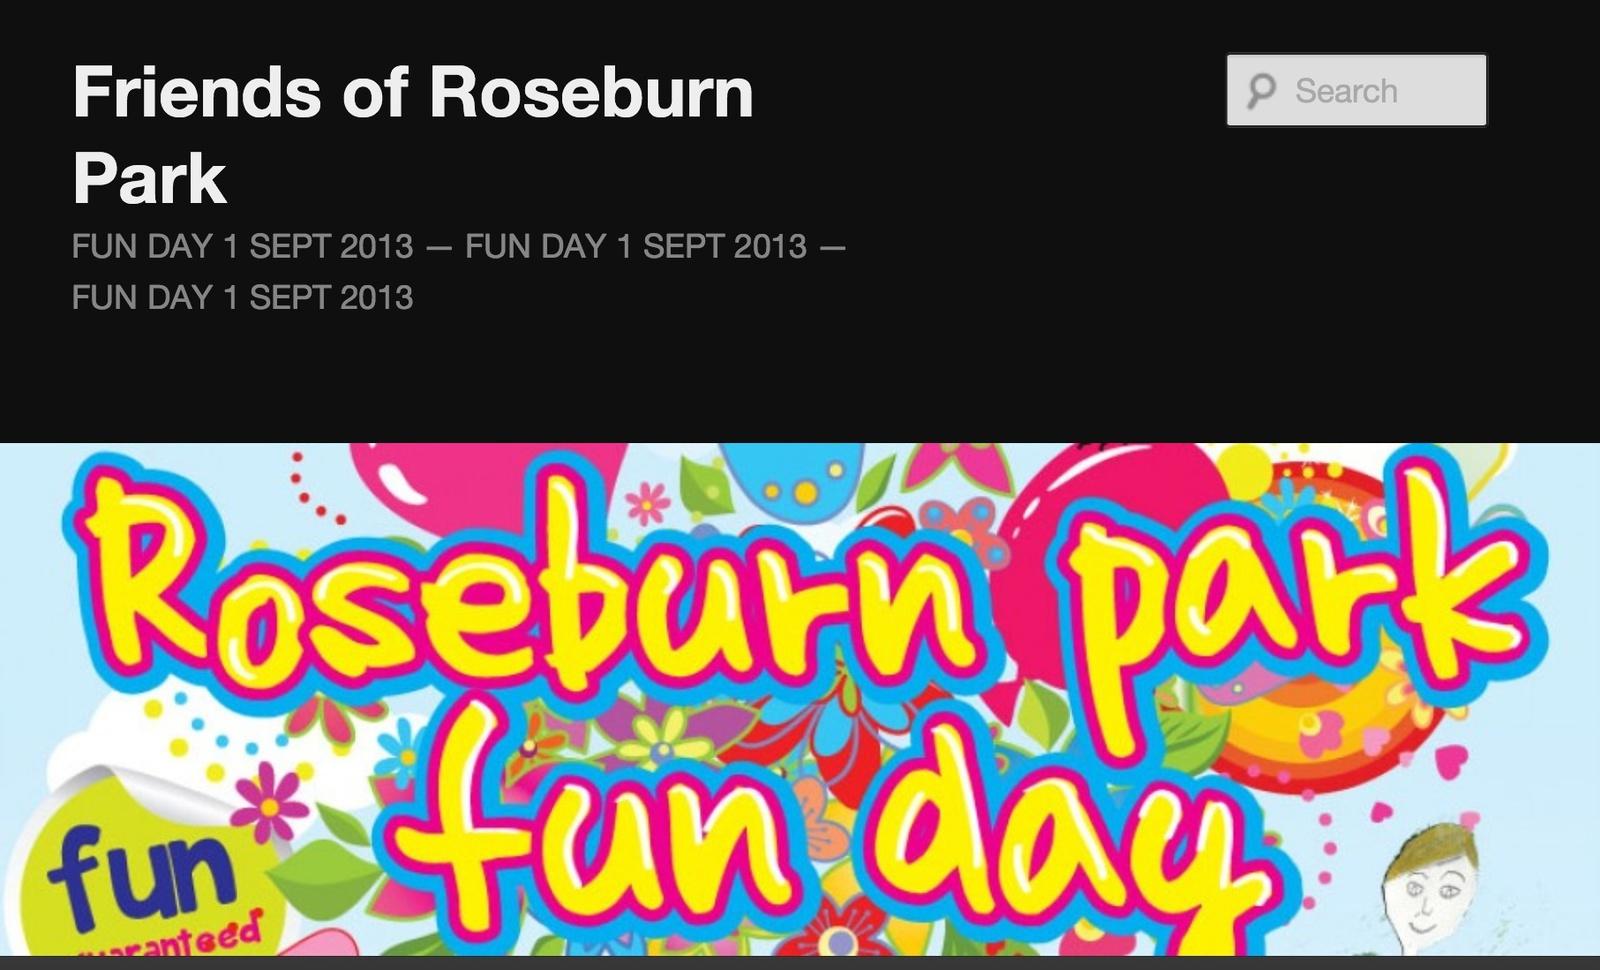 Bike Love today at Roseburn Park Fun Day